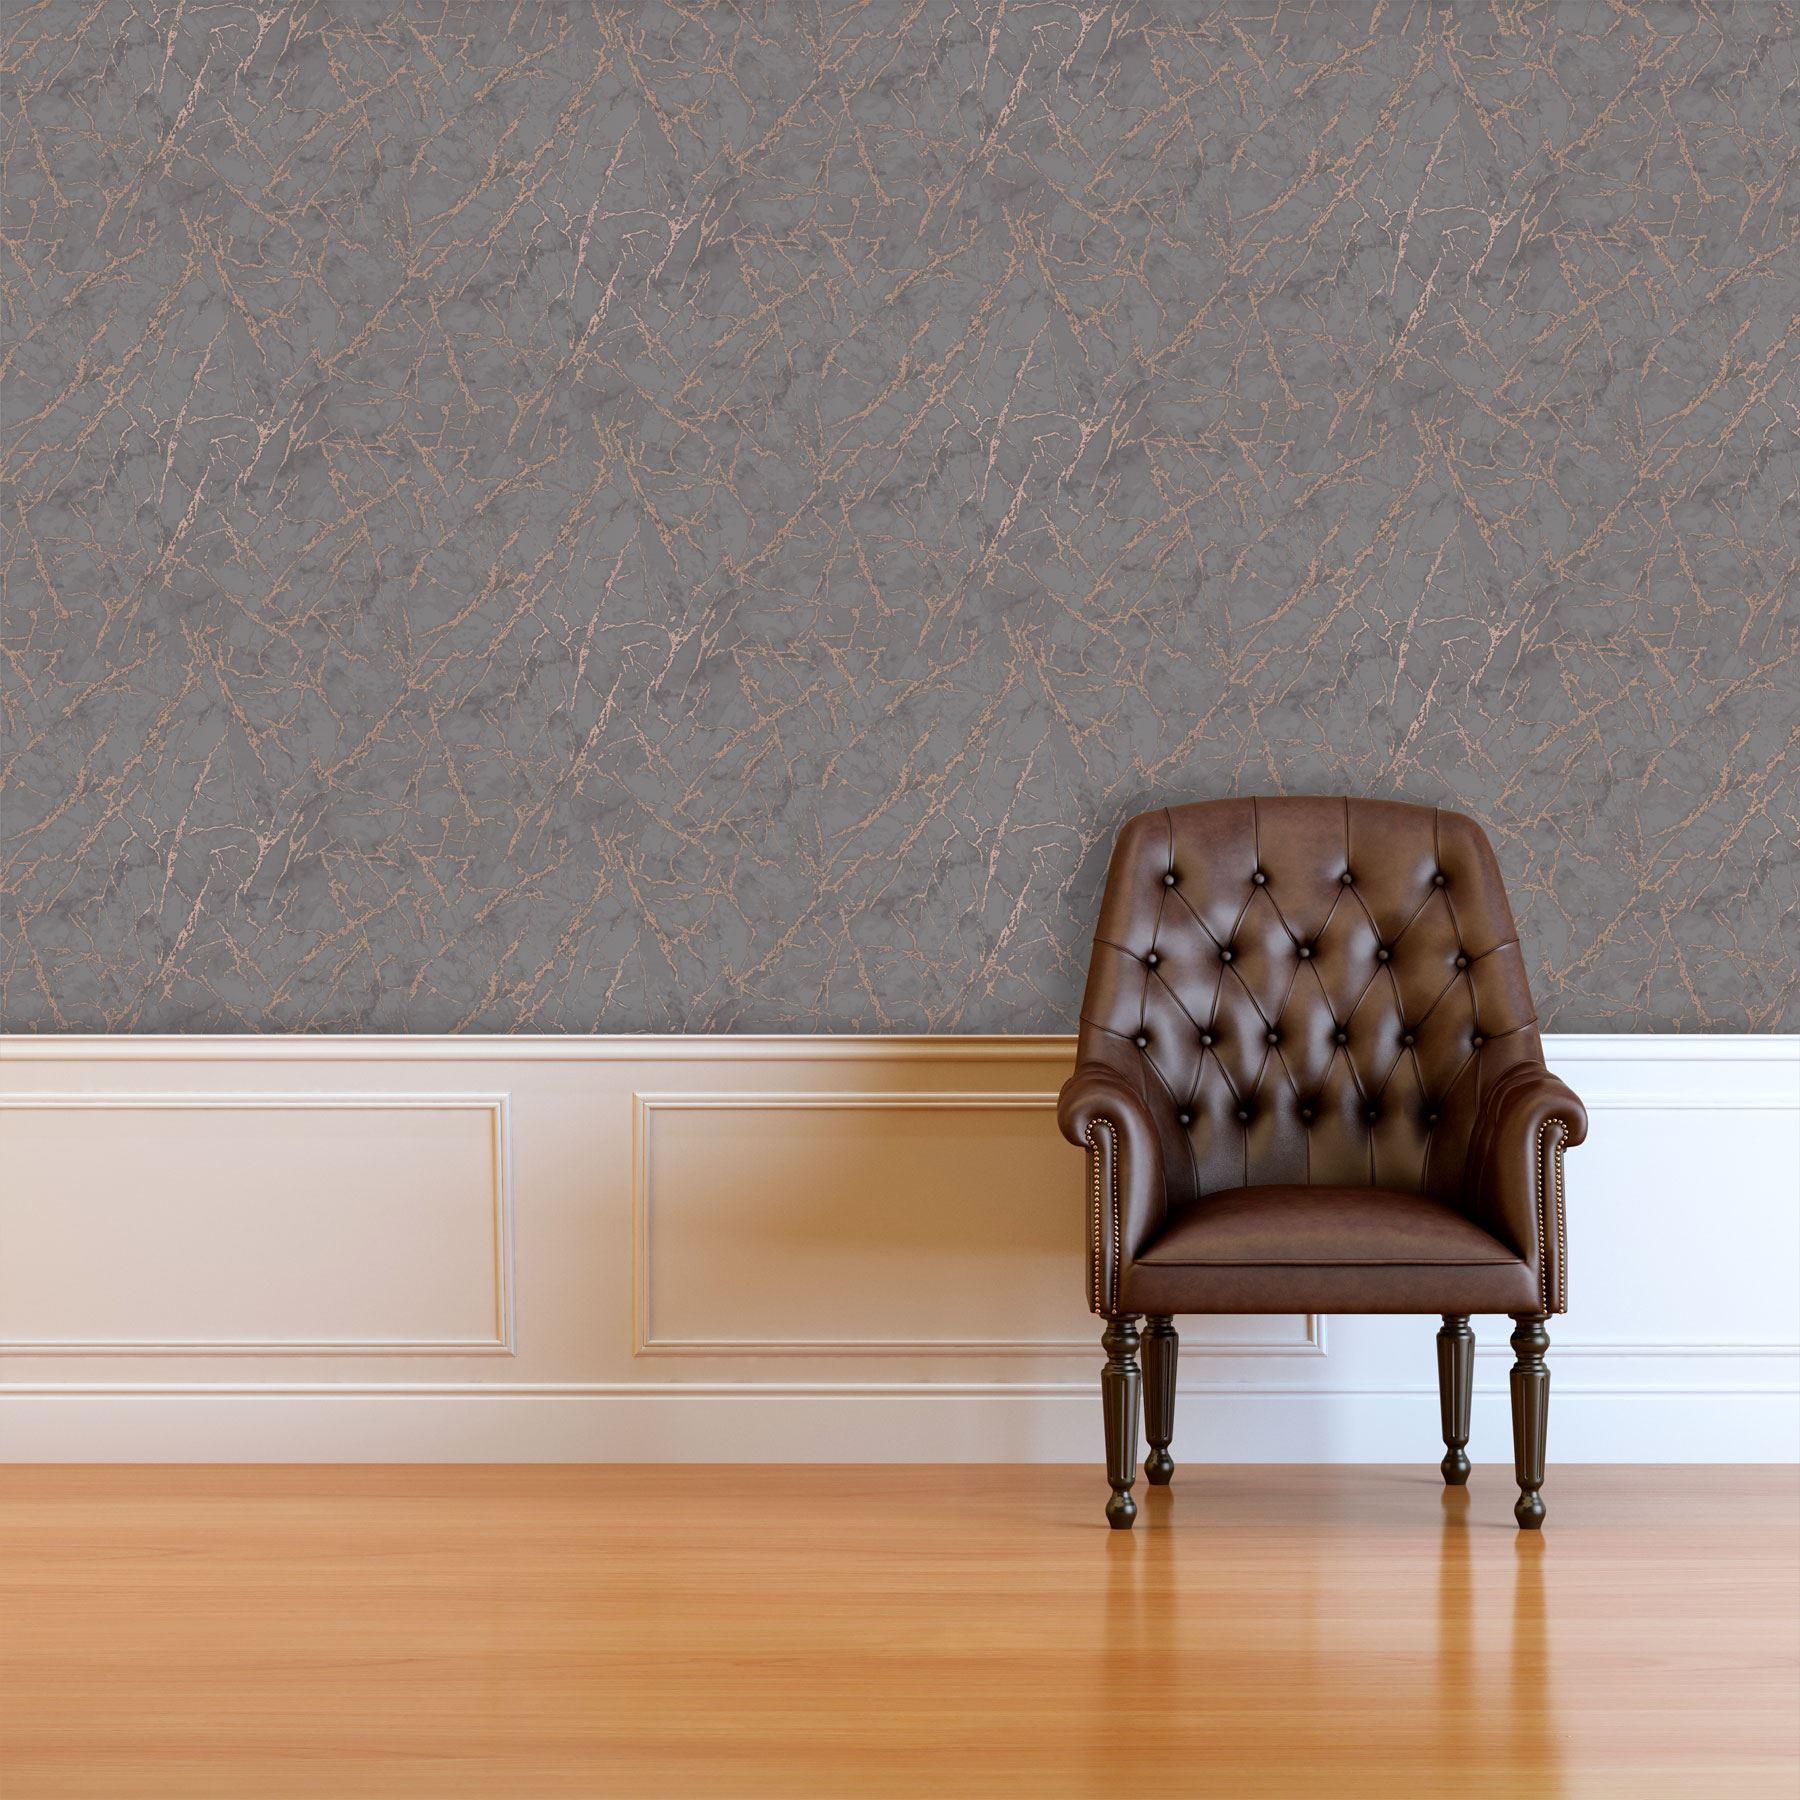 Most Inspiring Wallpaper Marble Wood - 2abe2246-6da5-4deb-8037-0a5c78892ce7  Snapshot_25103.jpg